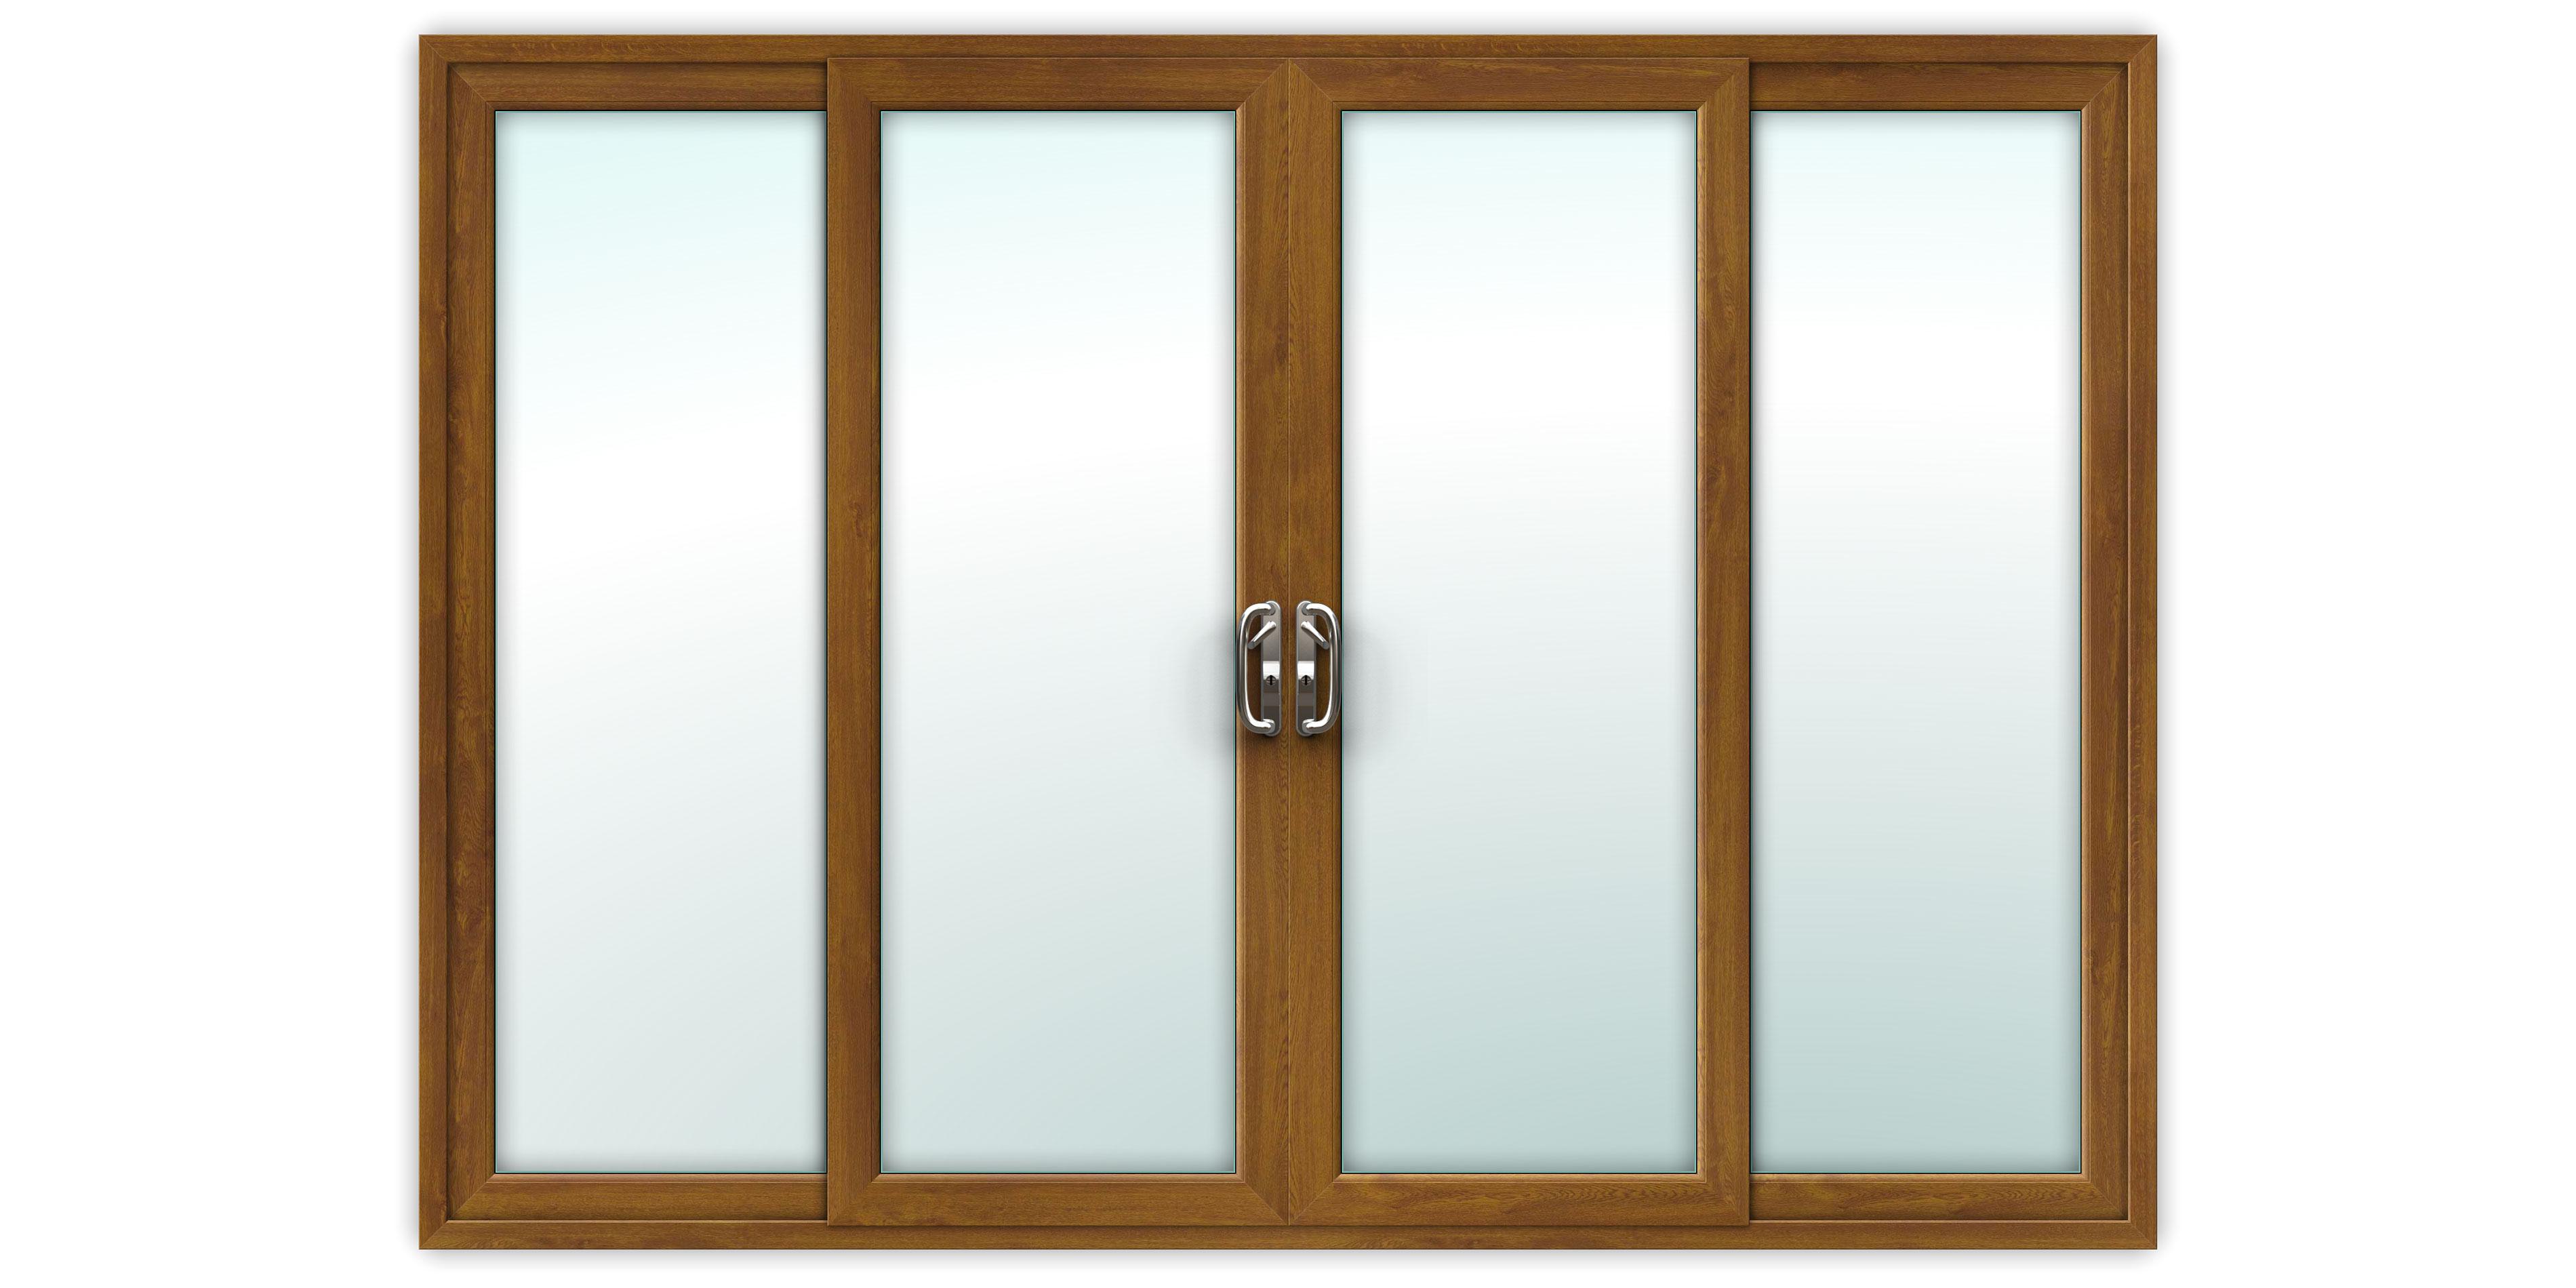 Upvc Sliding Patio Doors >> 10ft Golden Oak Upvc Sliding Patio Doors